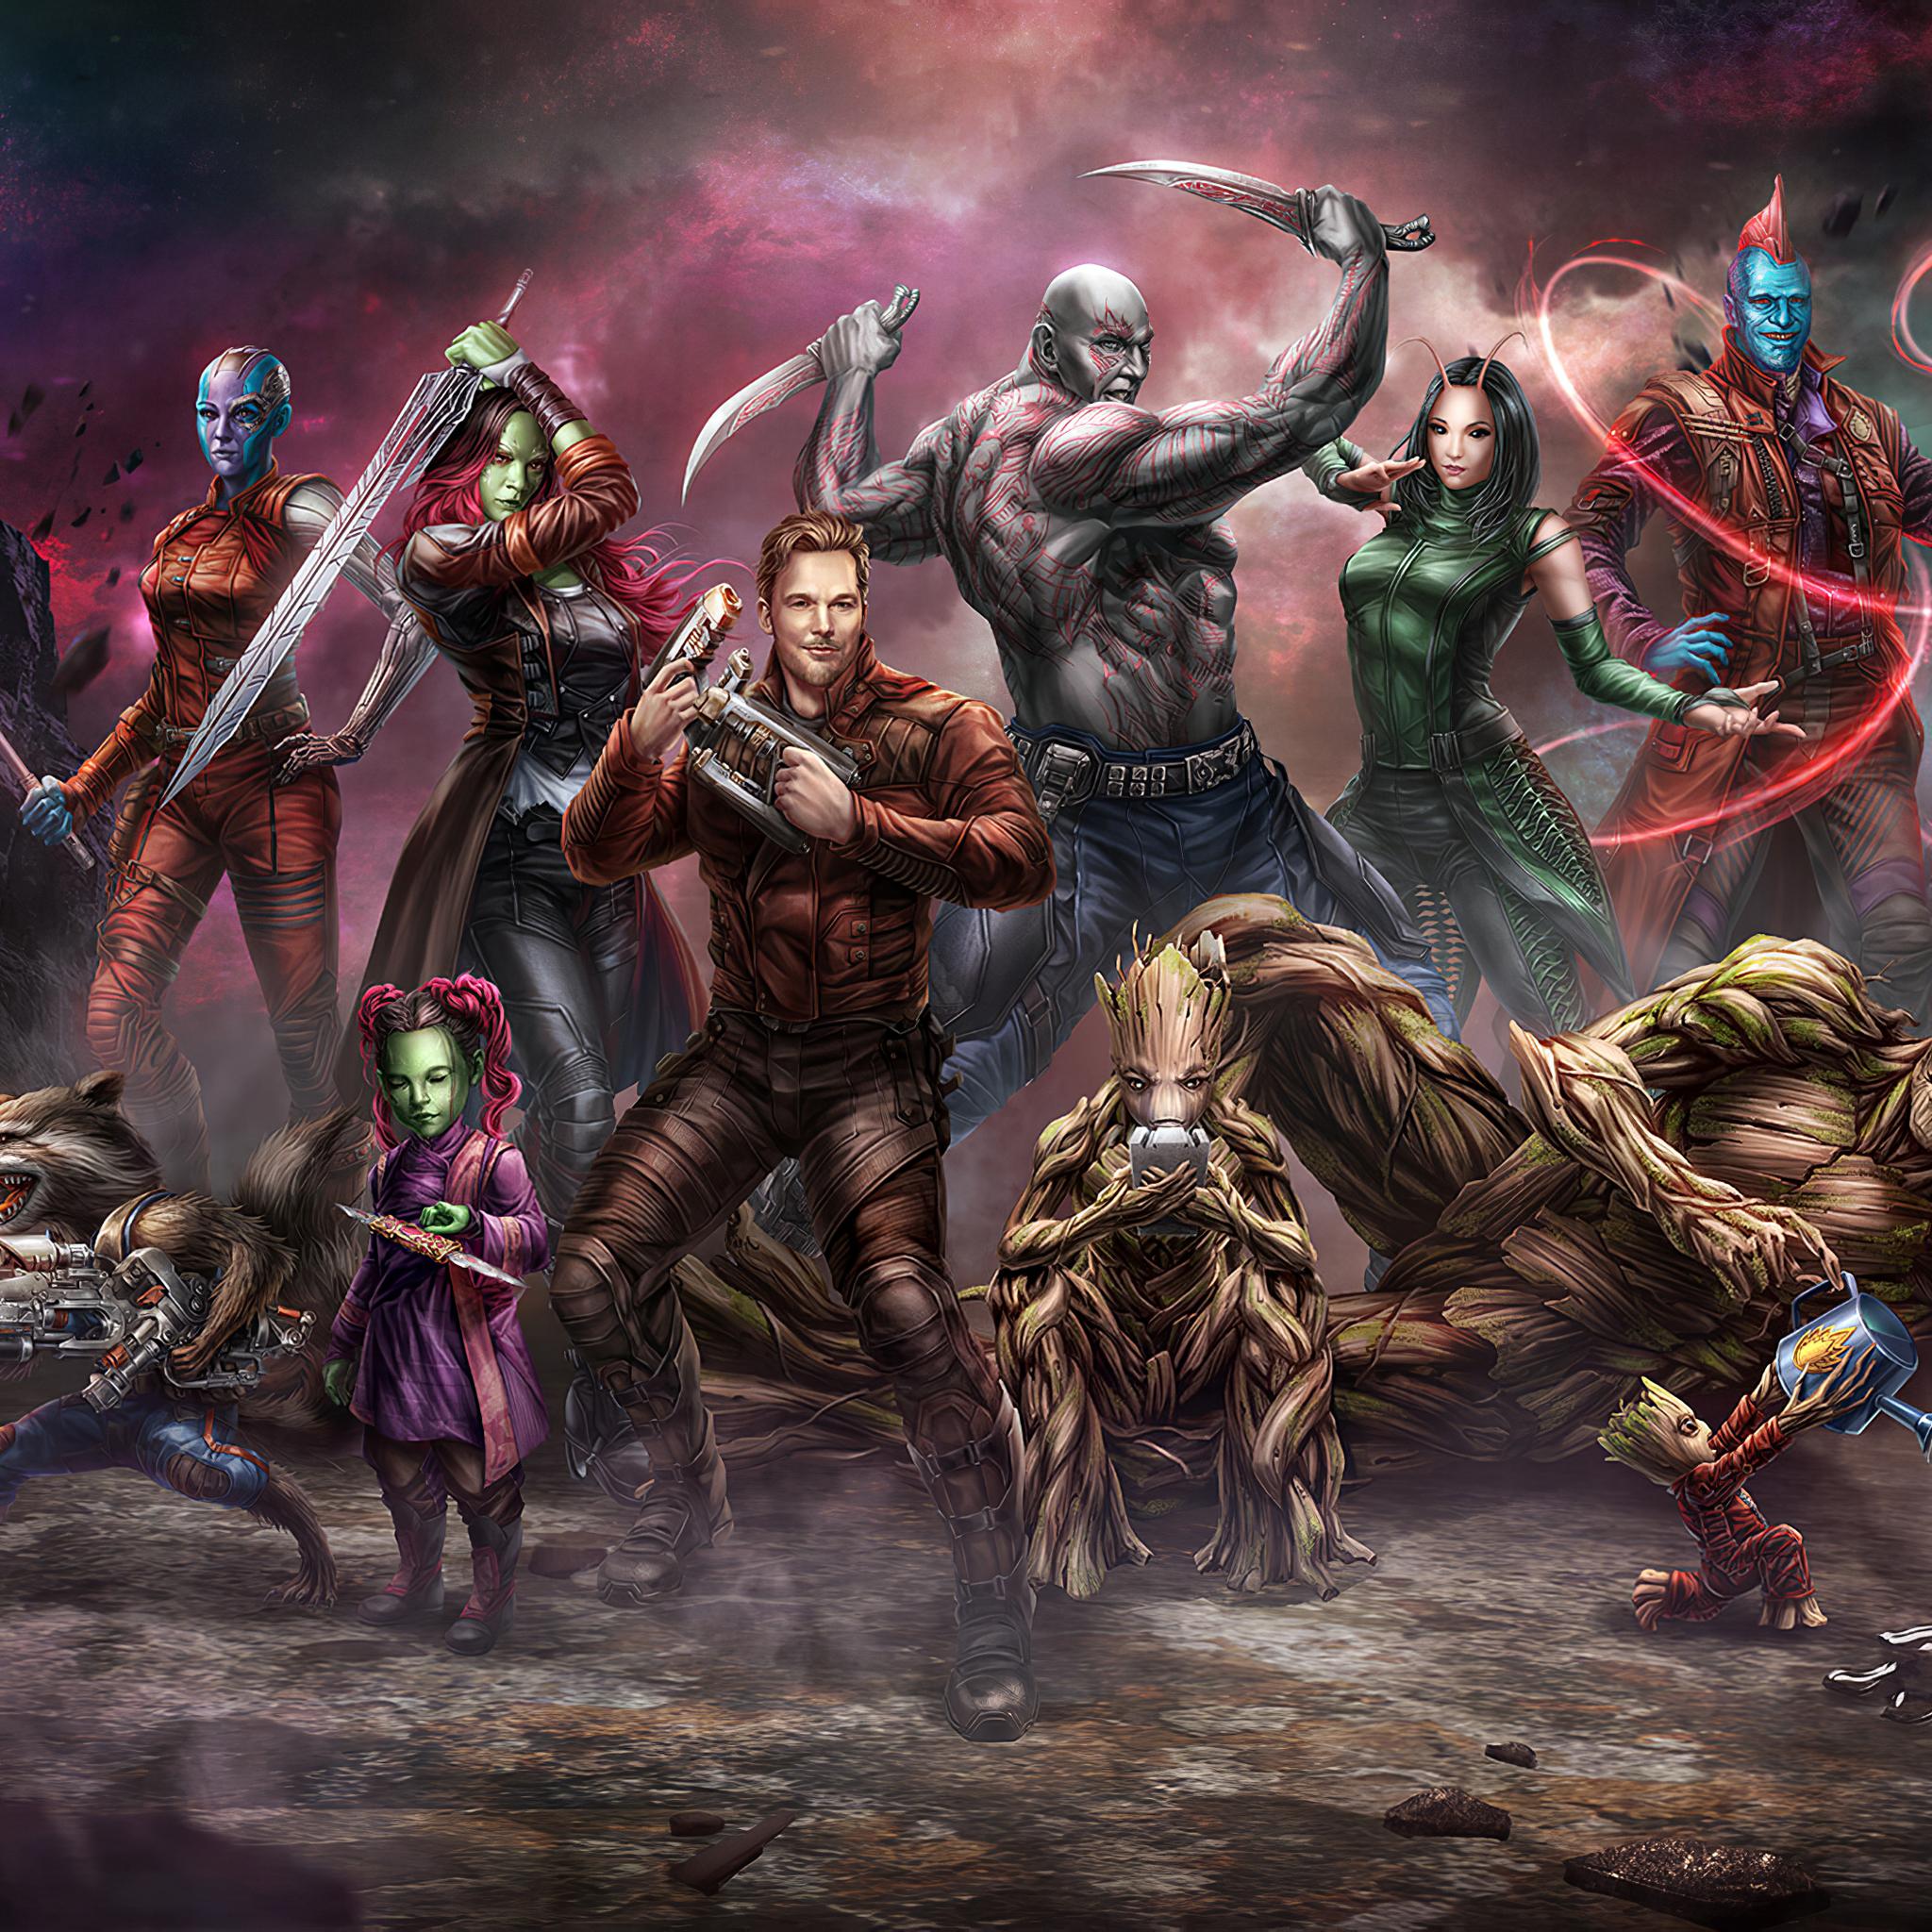 art-guardians-of-galaxy-vol-zu.jpg